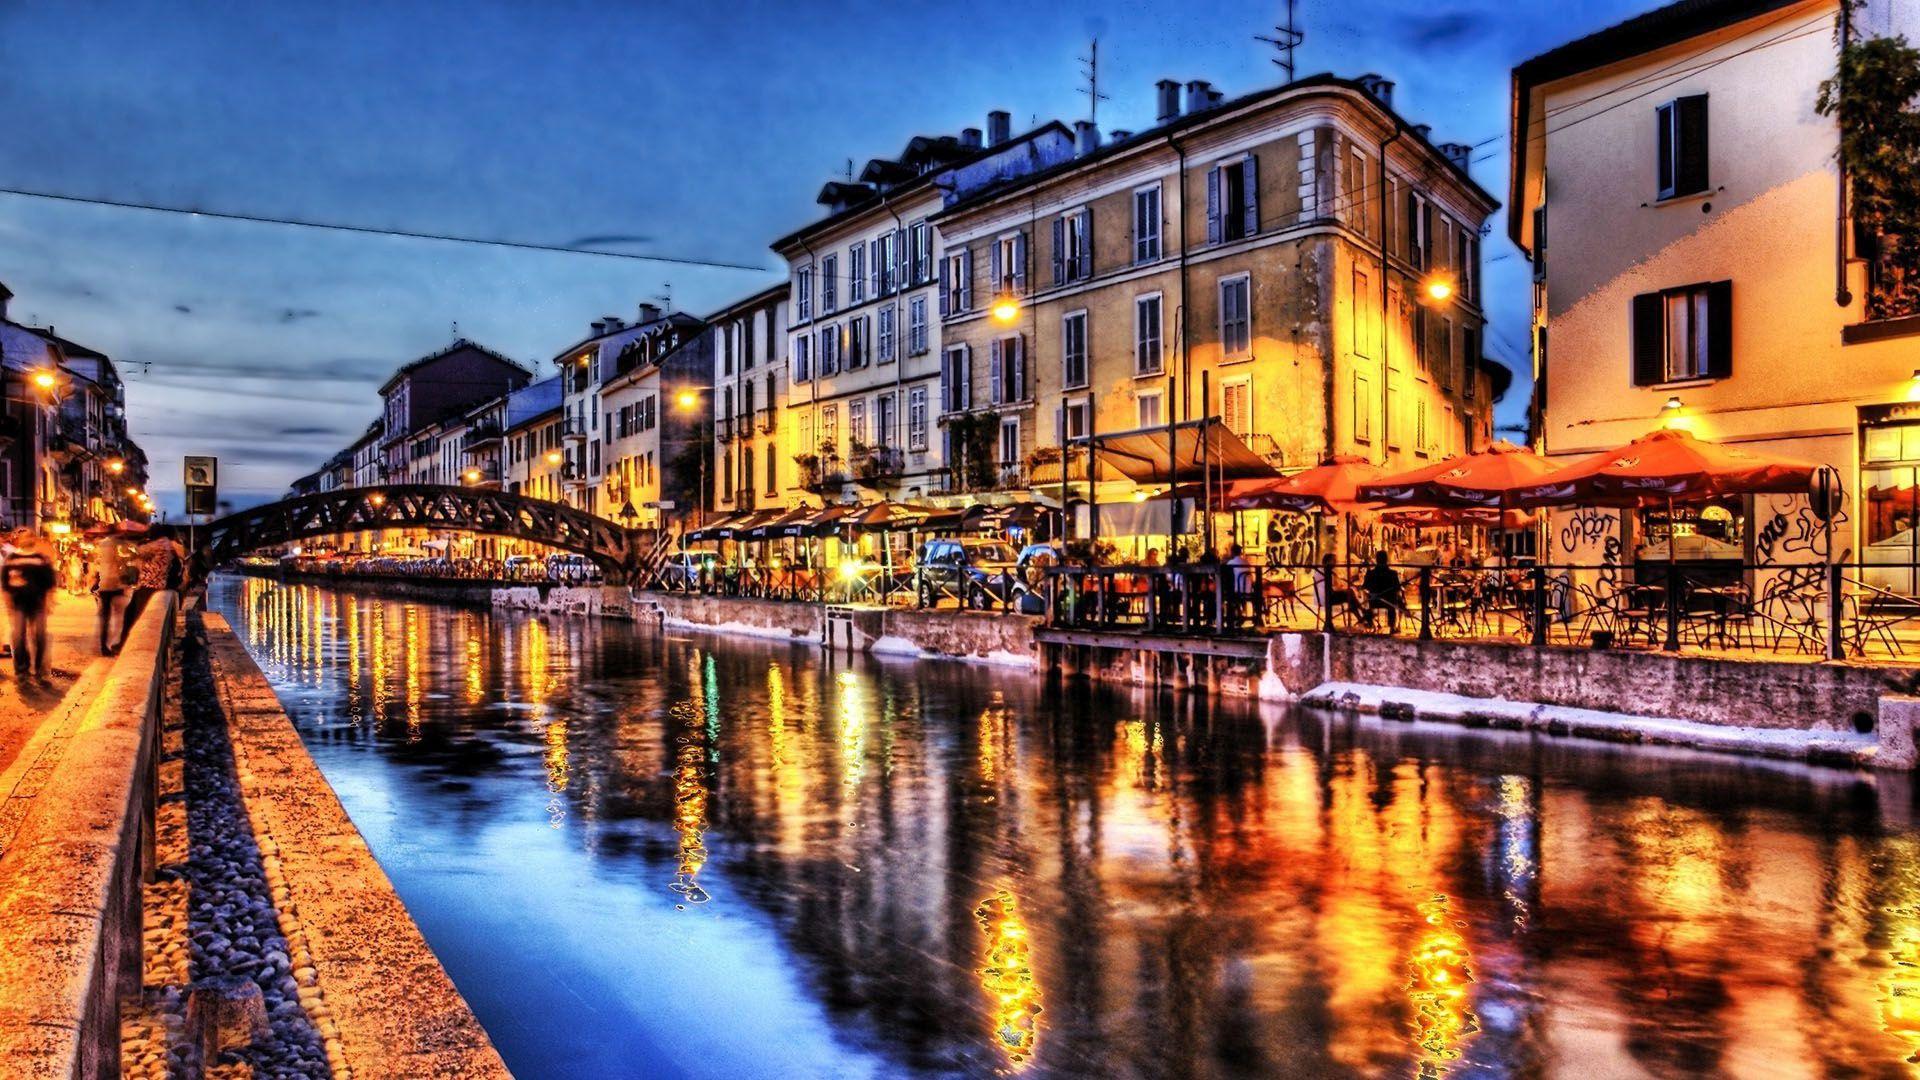 Venice Italy at Night Venice at night wallpaper   304571 Water 1920x1080